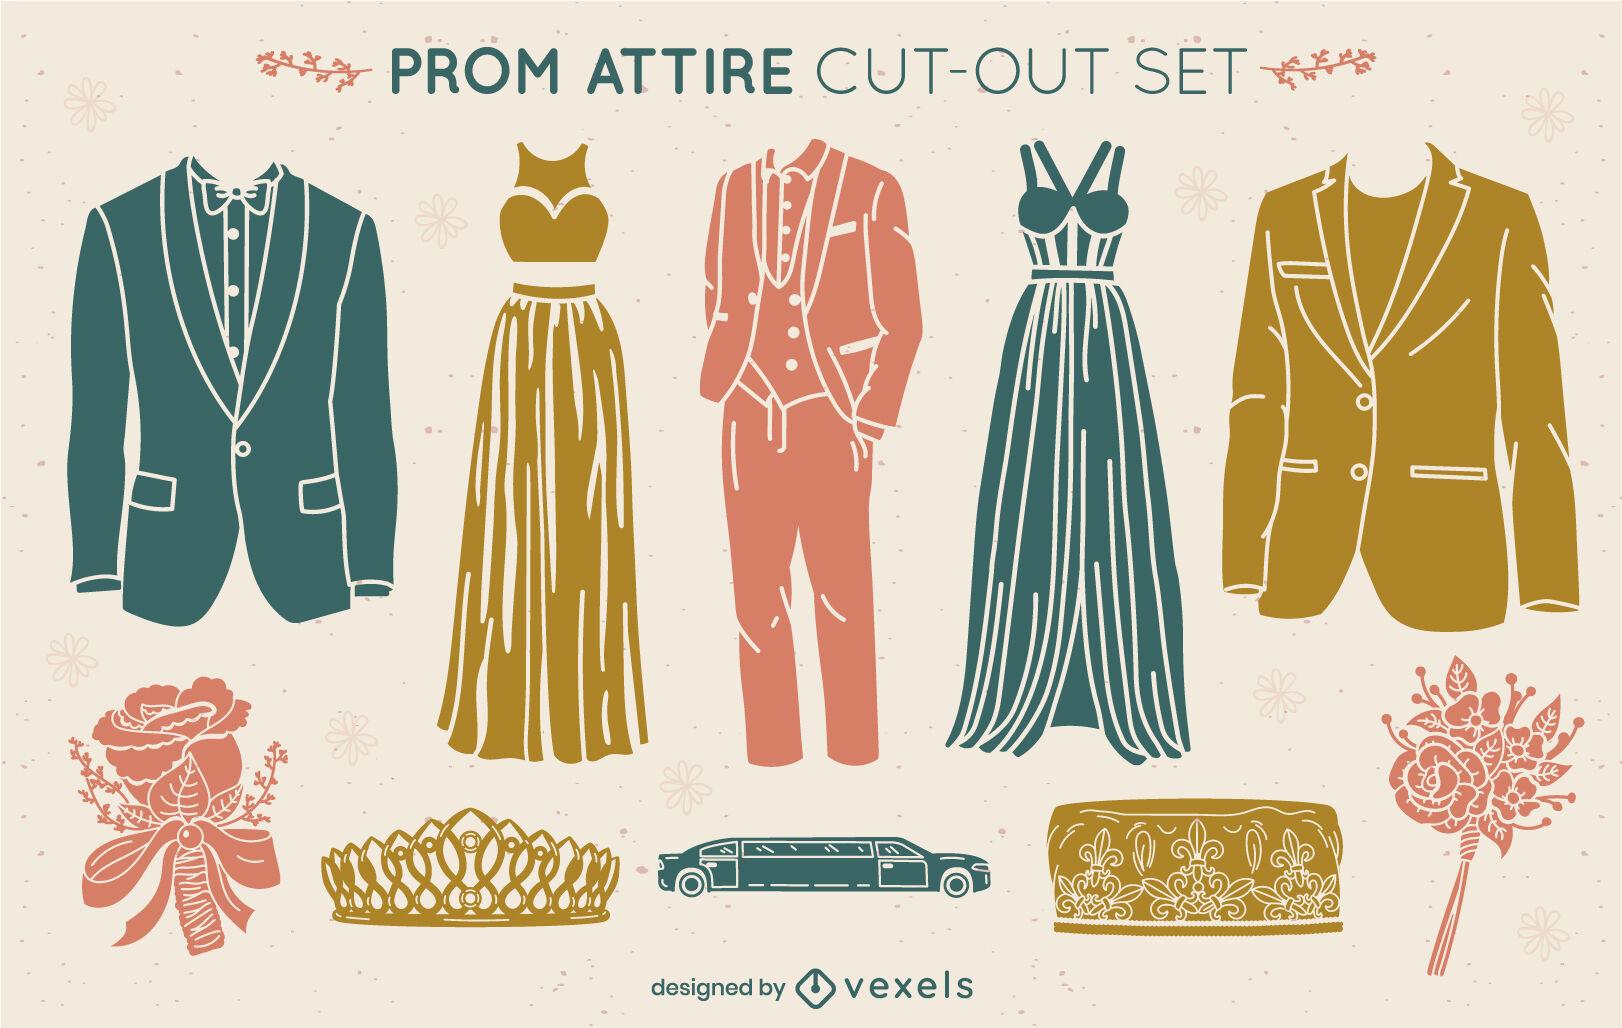 Prom formelle Partykleidung Ausschnitt-Set